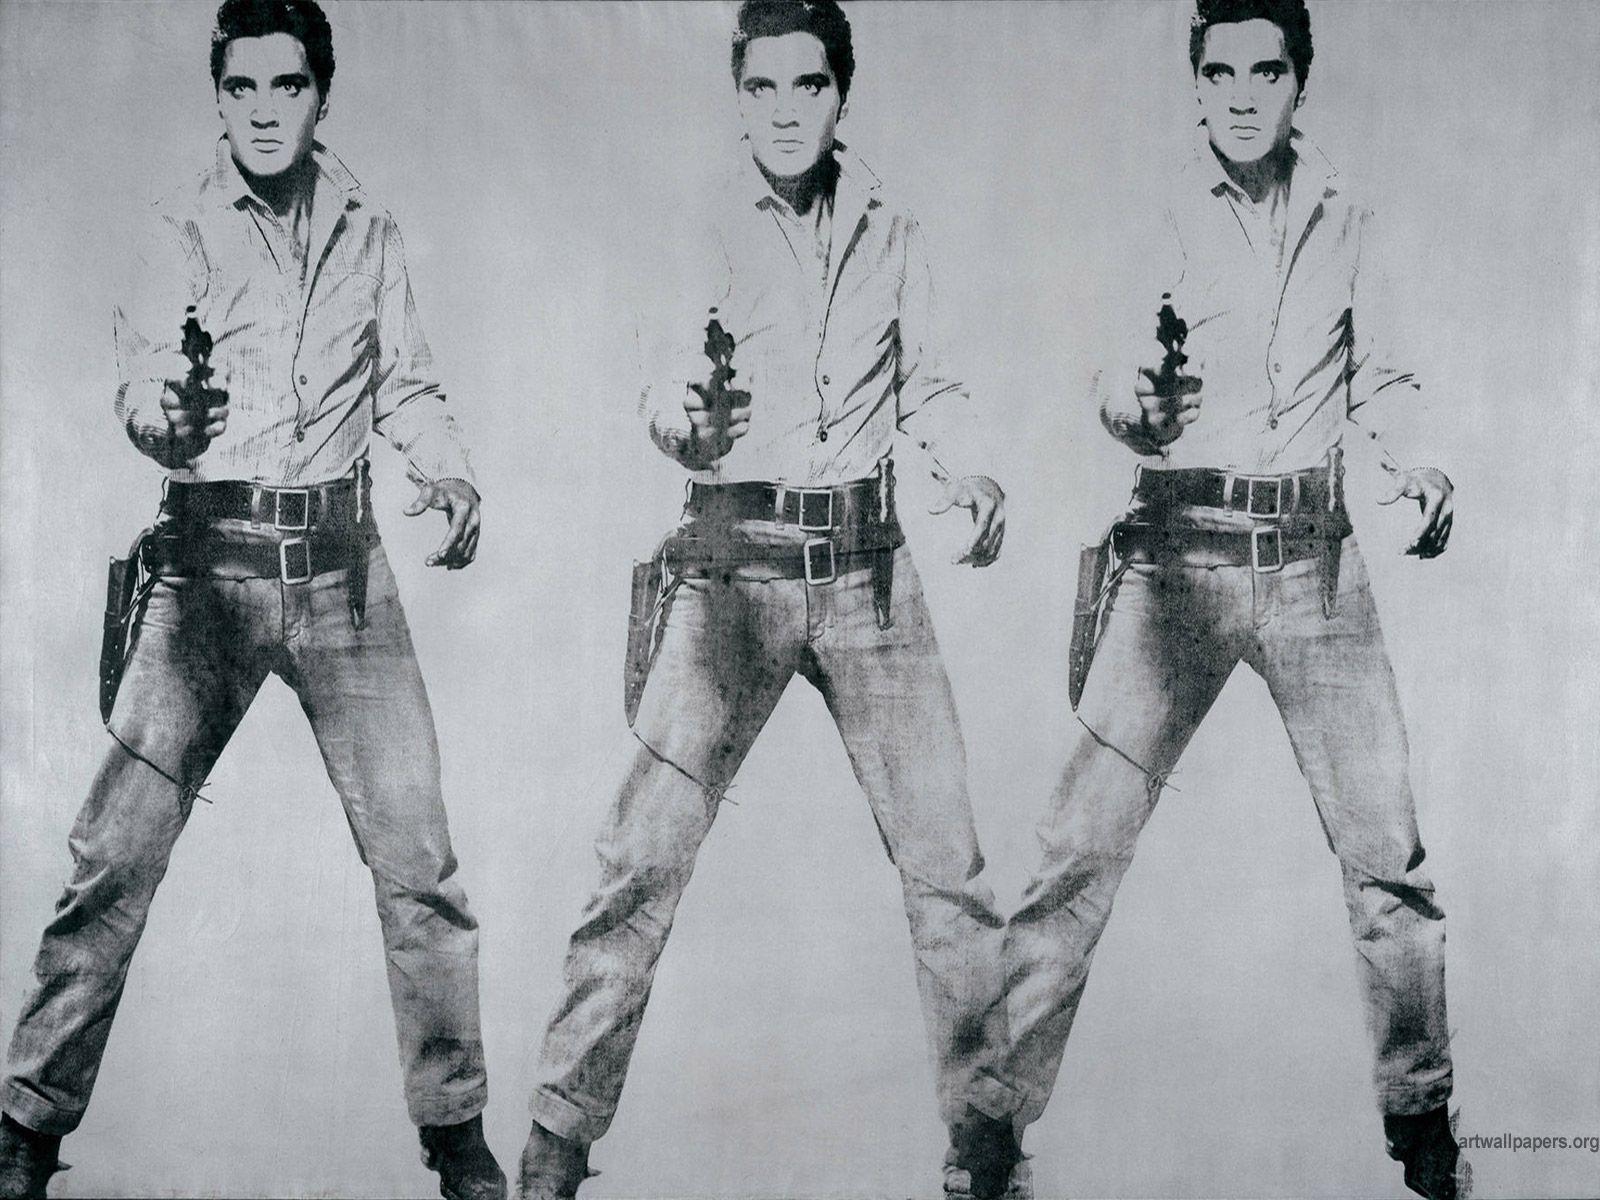 andy warhol art | Wallpapers Art Pop Andy Warhol 1600x1200 | #402186 #art pop